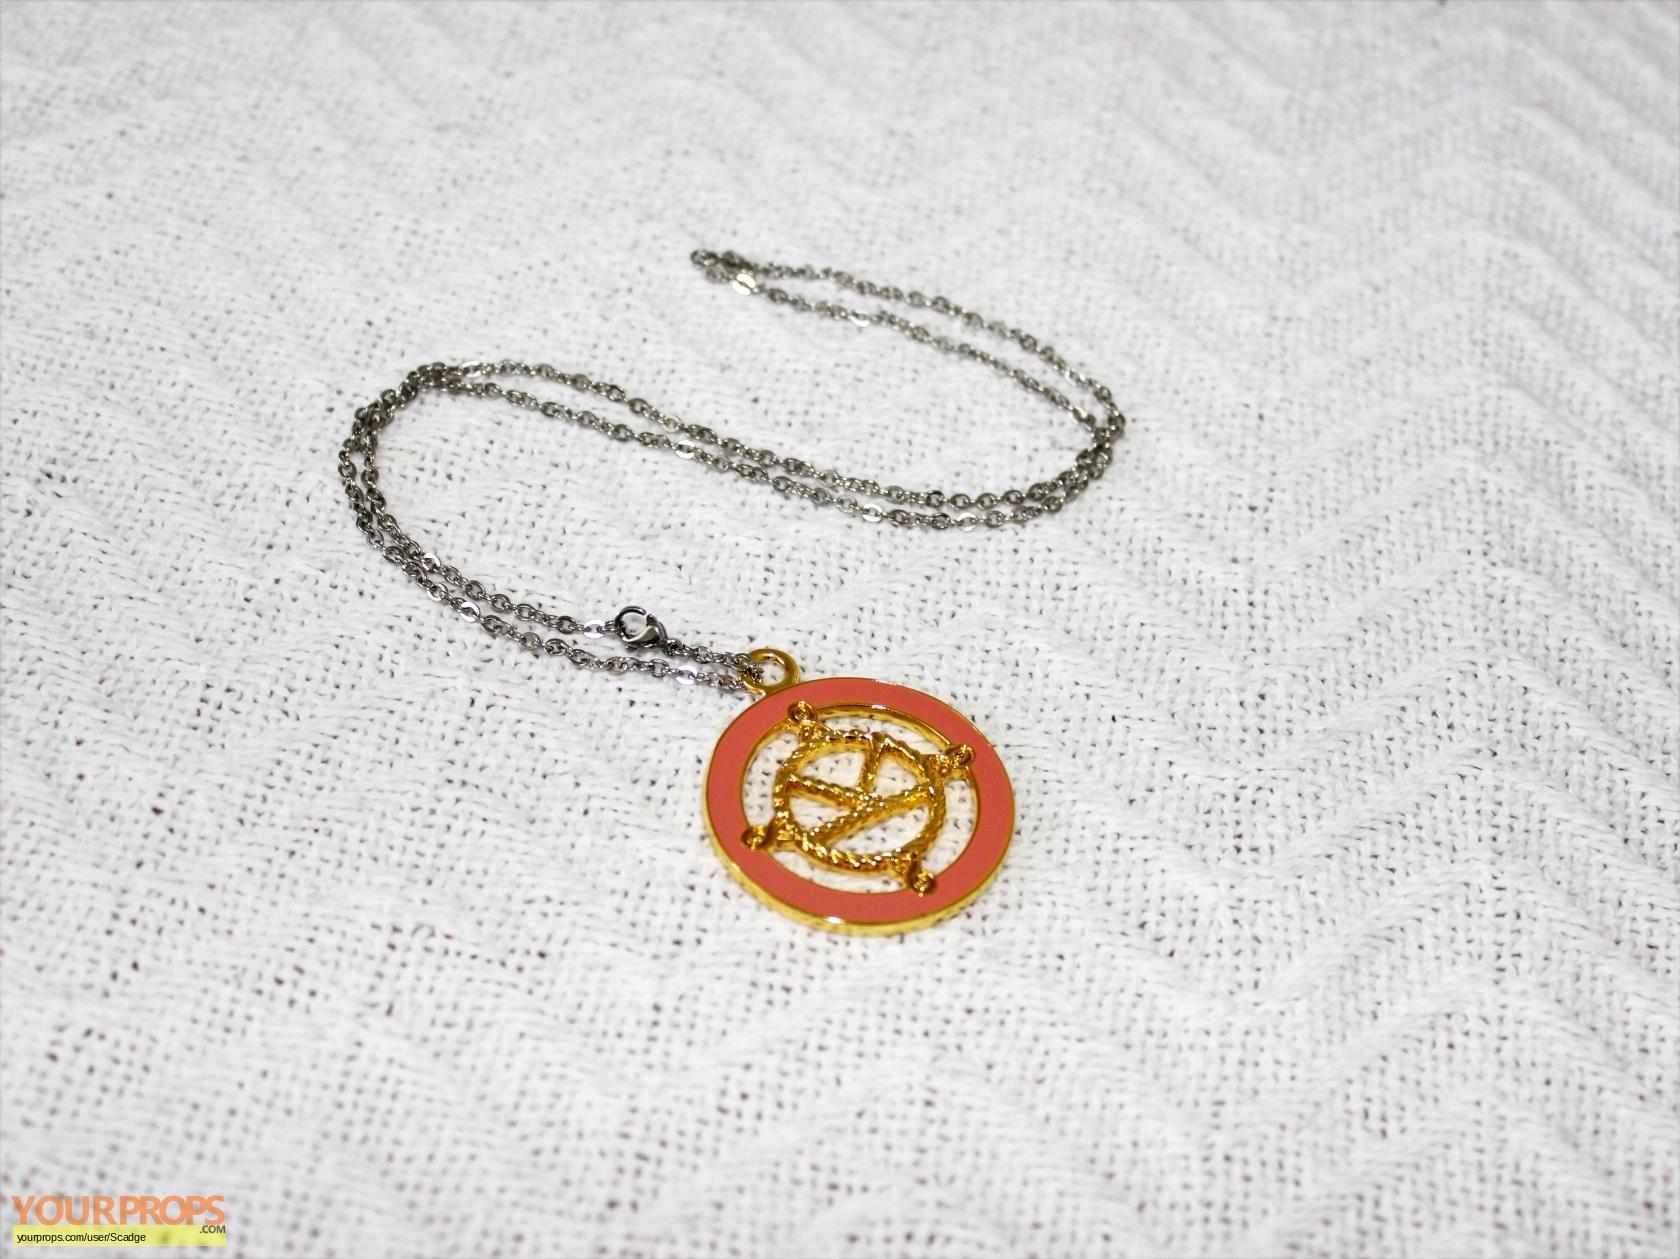 Kingsman: The Secret Service Kingsman Medal of Valor replica